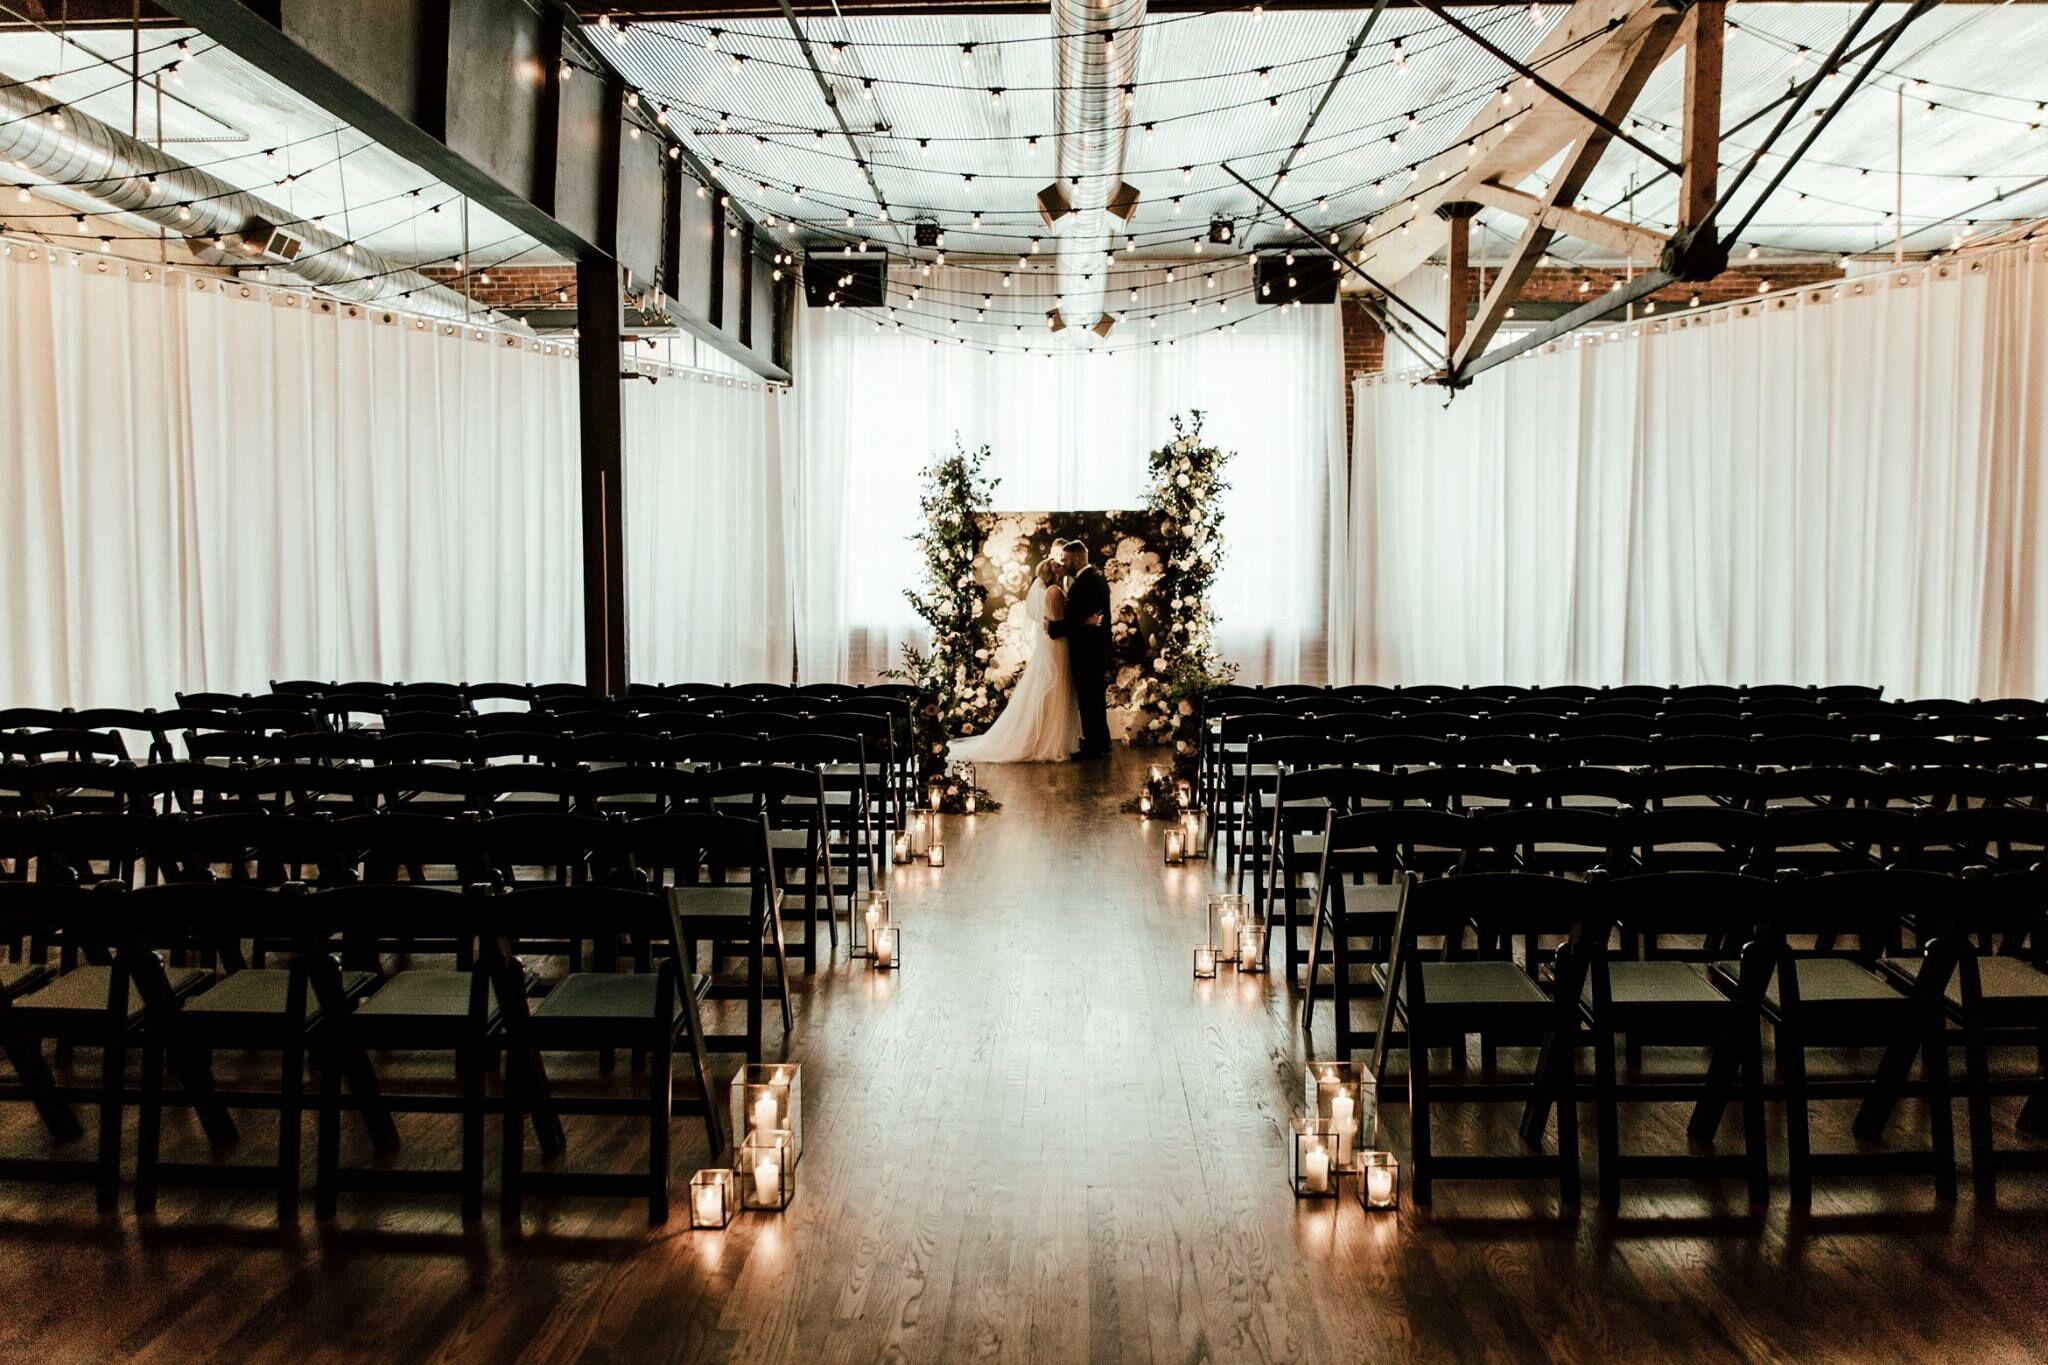 Kansas City Wedding Venues.Wedding Venues In Kansas City Mo The Knot